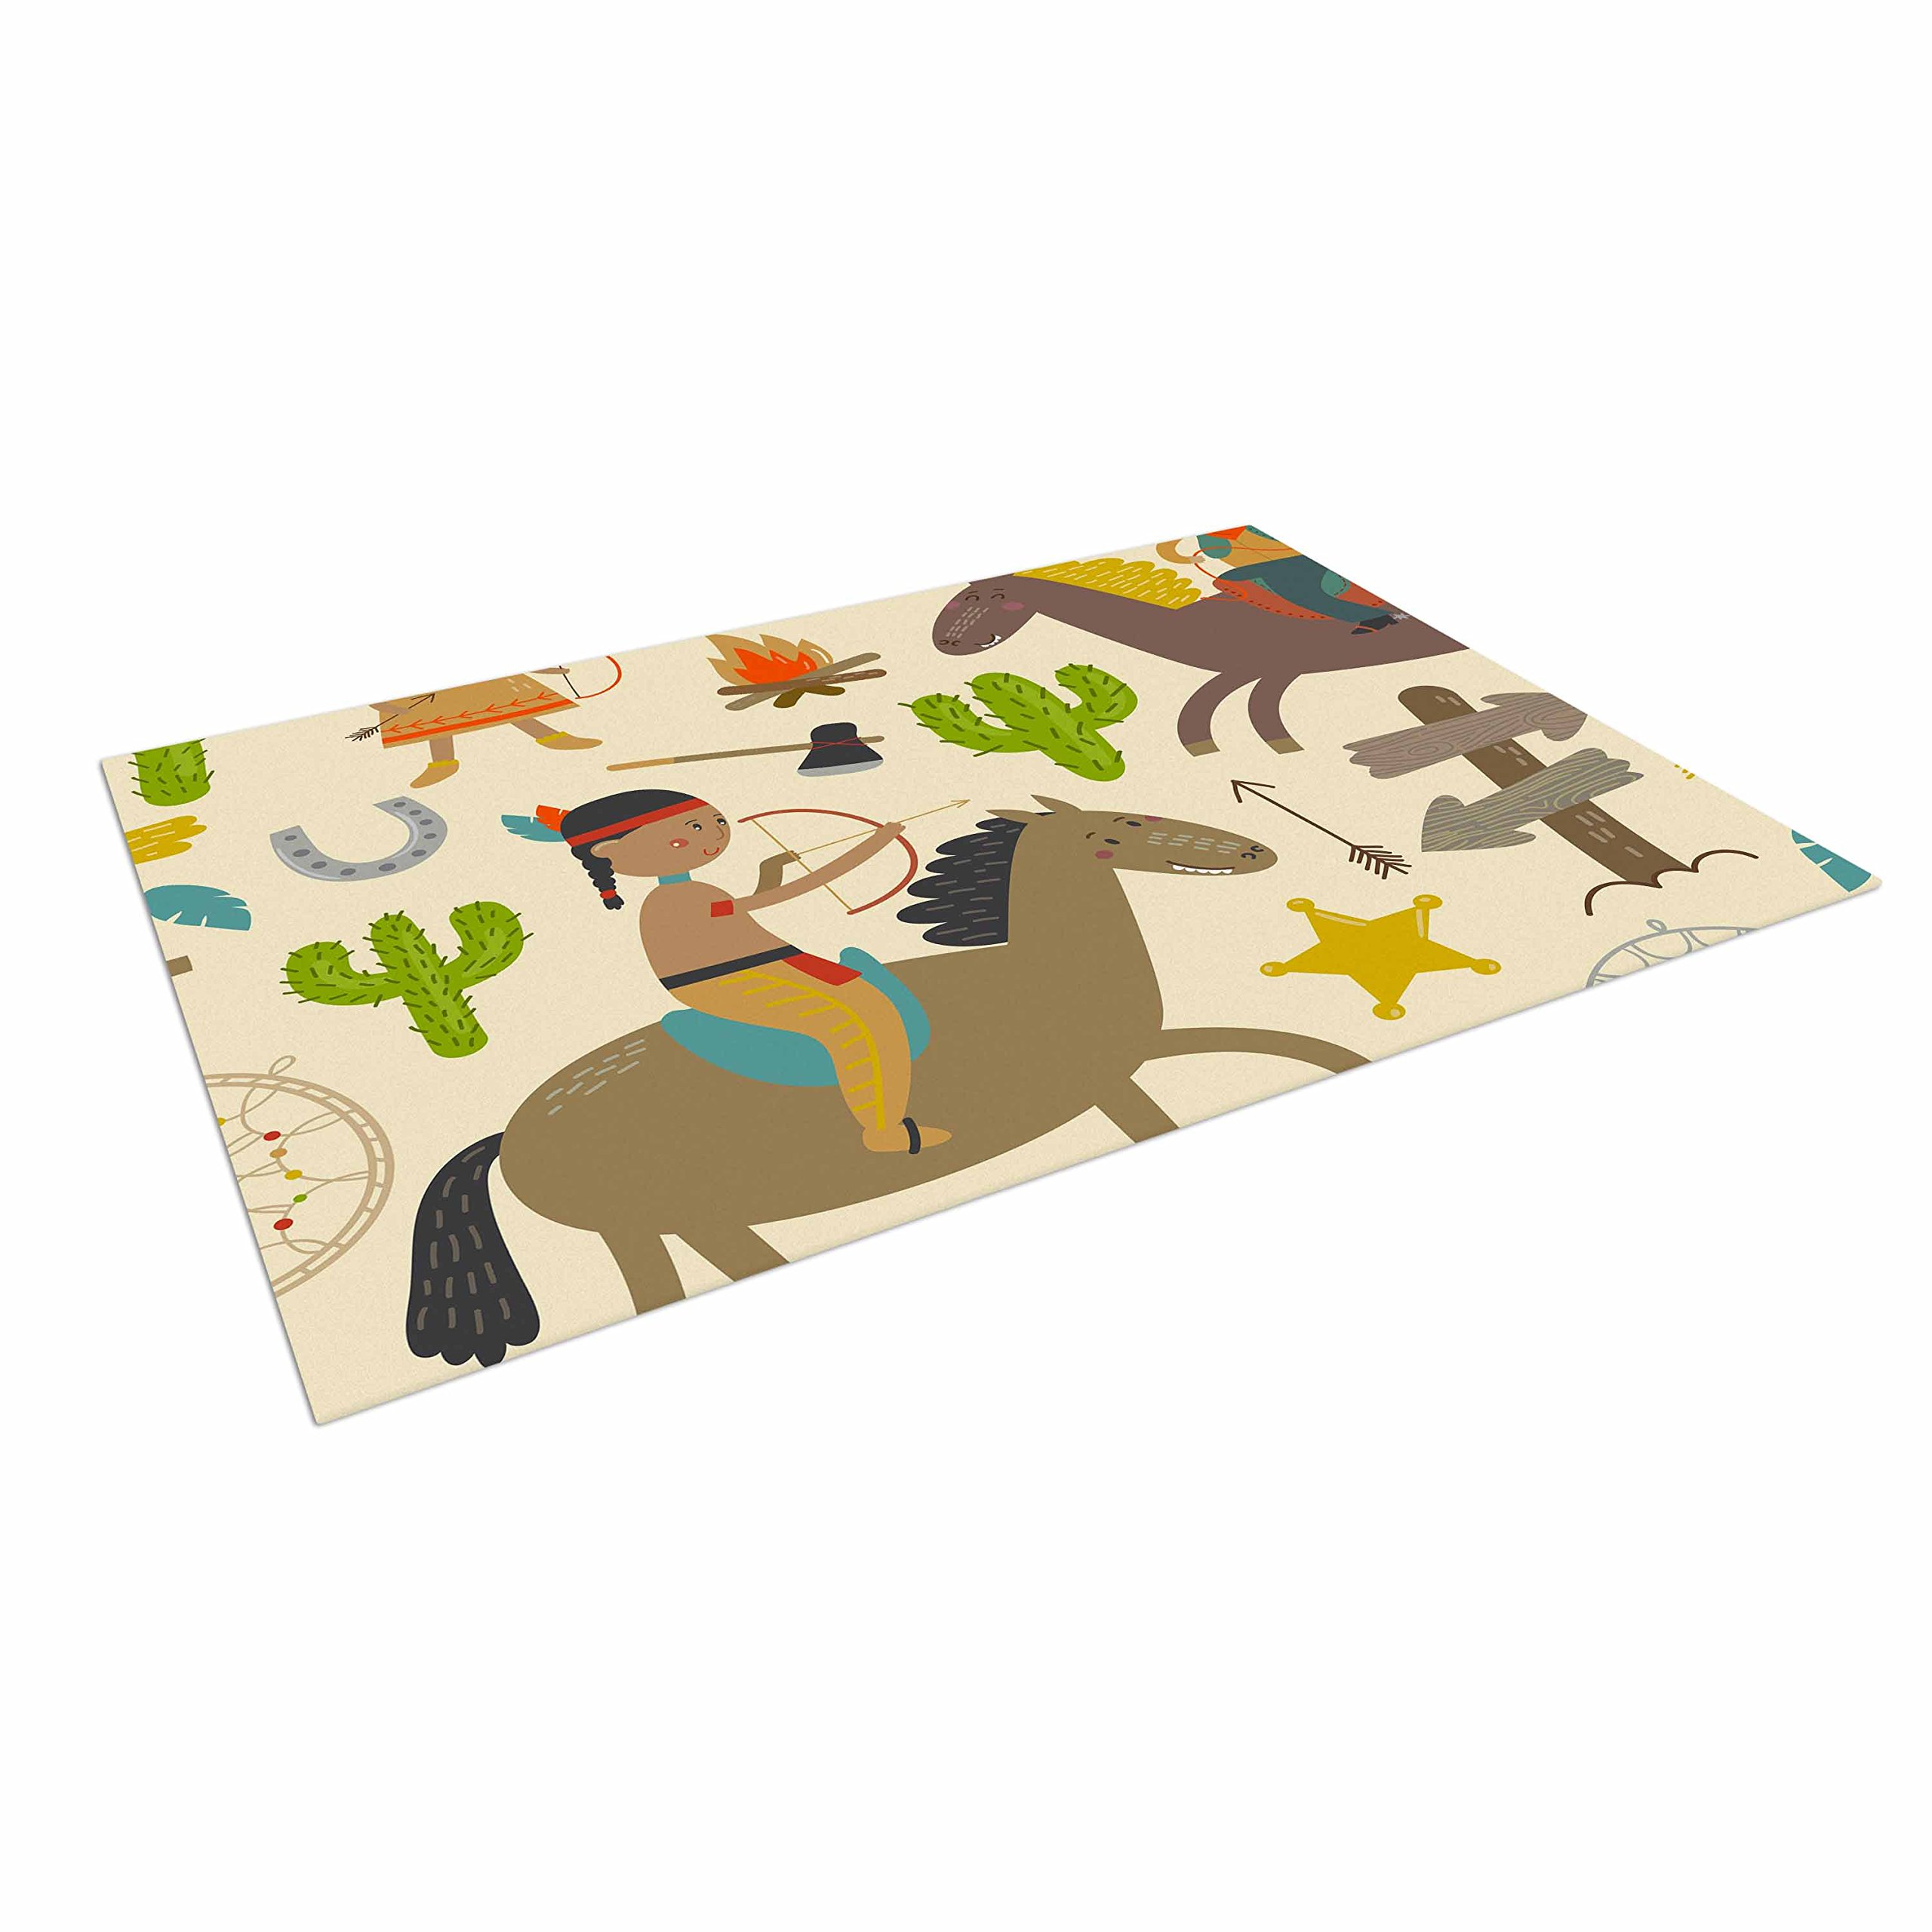 KESS InHouse Petit Griffin ''Tipi'' Brown Kids Outdoor Floor Mat, 4' x 5'